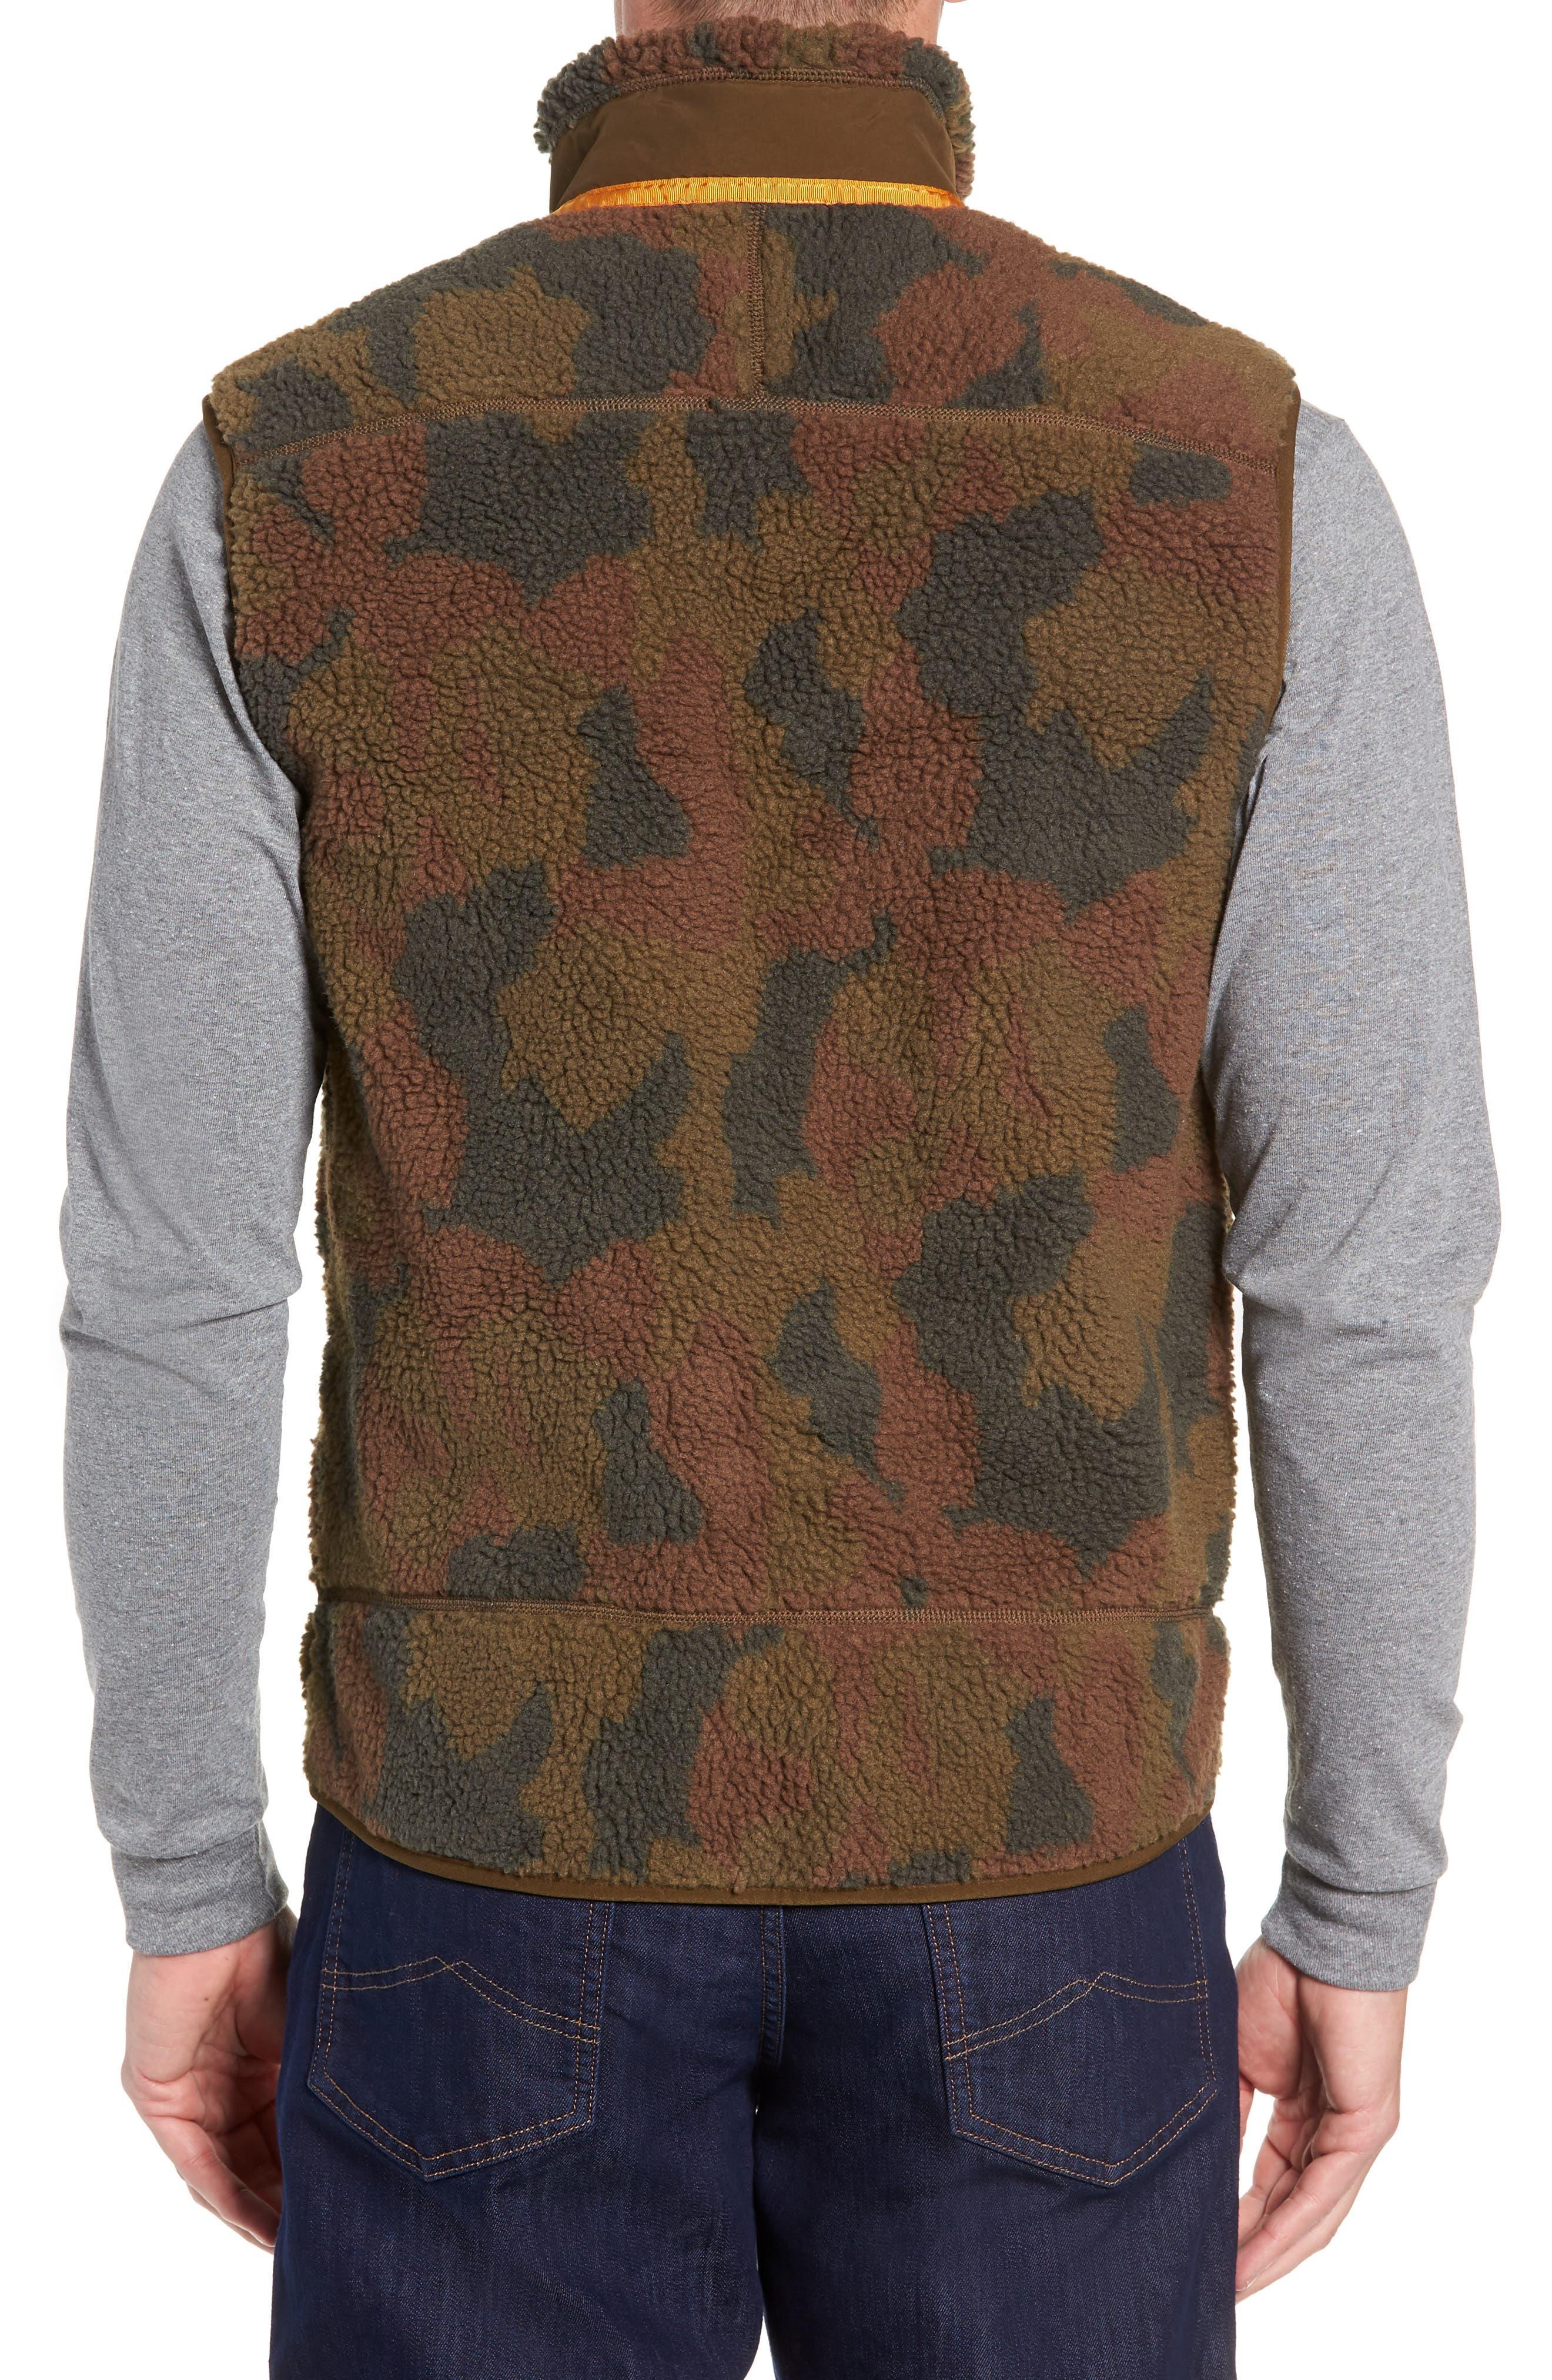 Classic Retro-X<sup>®</sup> Windproof Vest,                             Alternate thumbnail 2, color,                             BUNKER CAMO CARGO GREEN